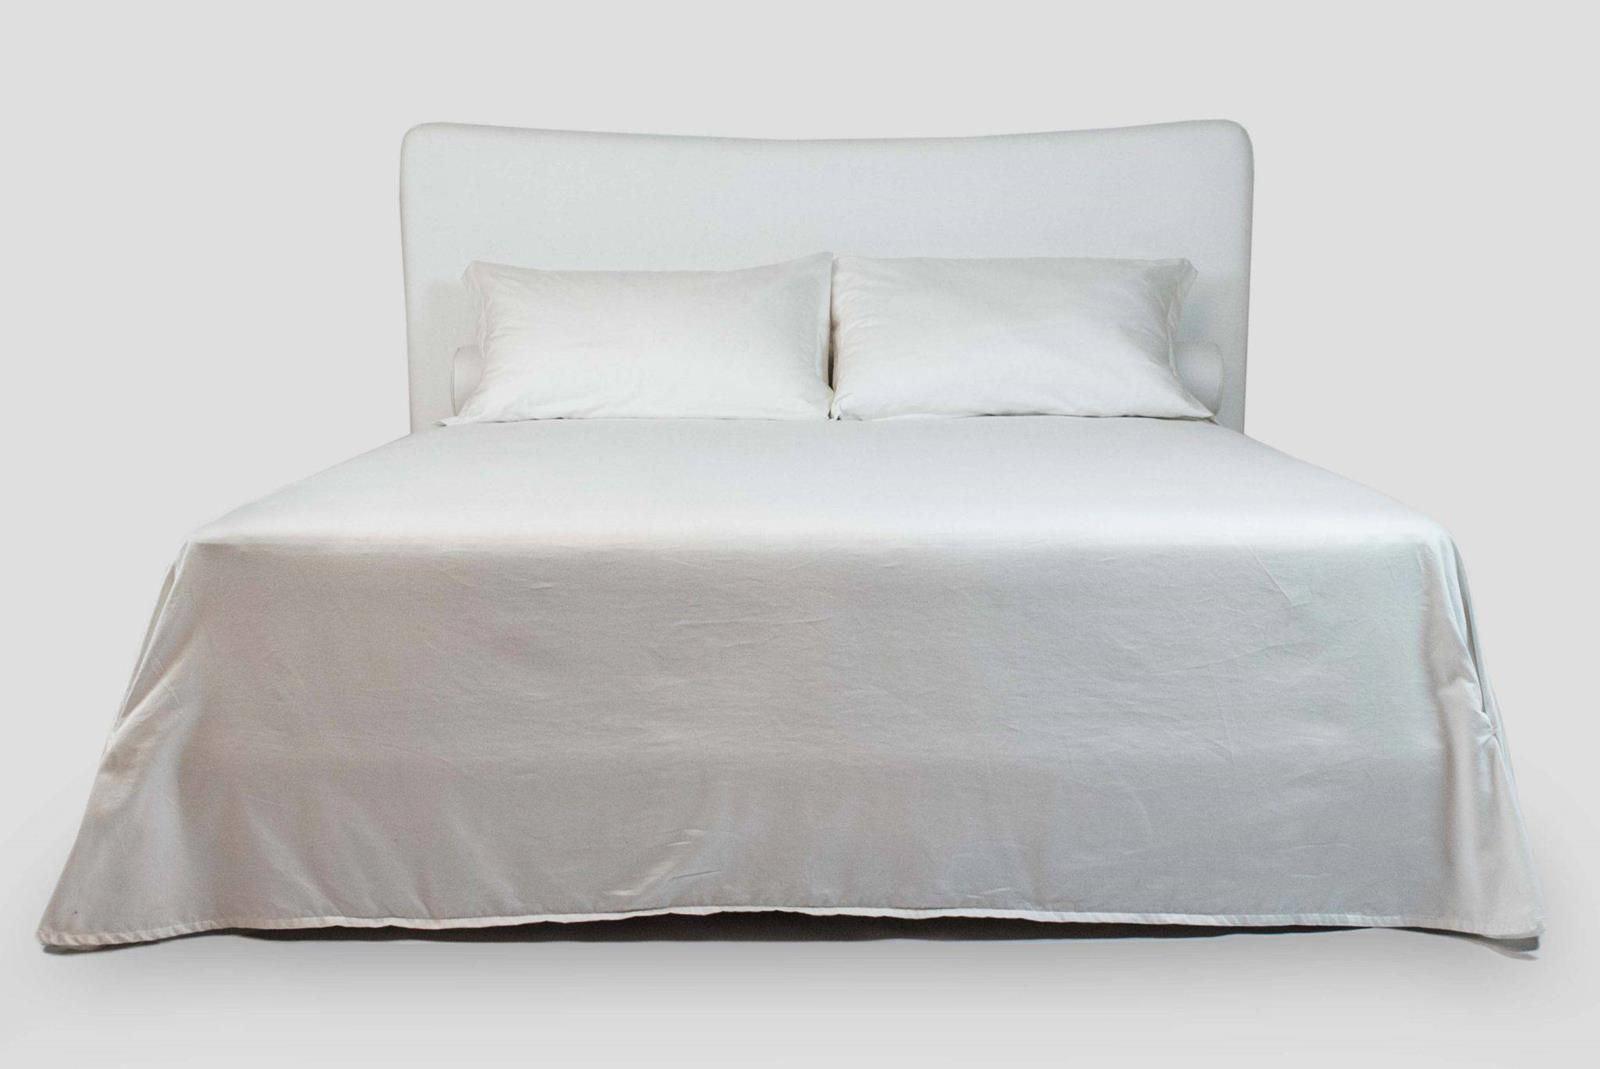 upholstered custom made bed